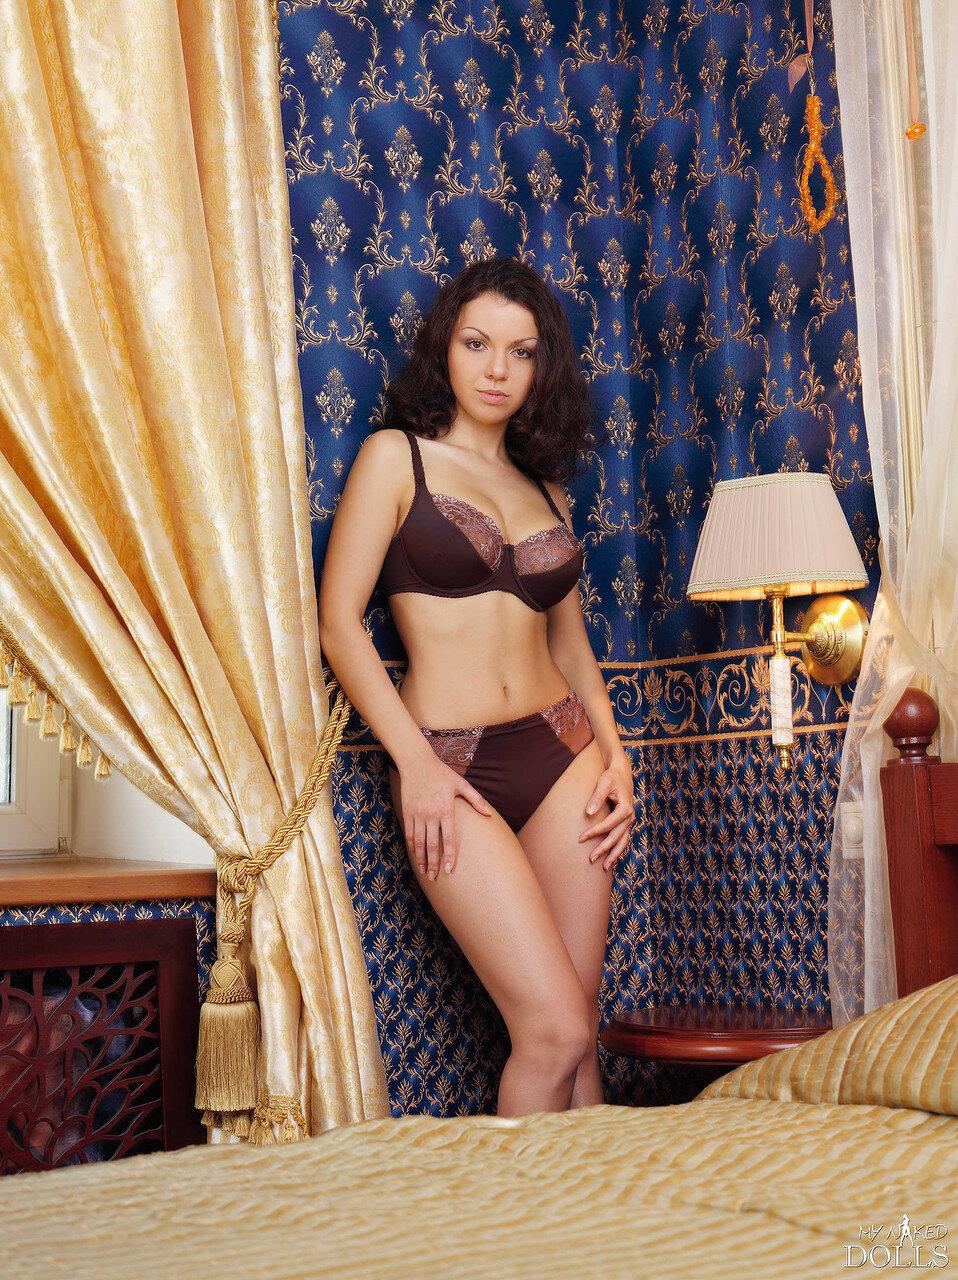 Кристина шмидт фото модель эротика 5 фотография